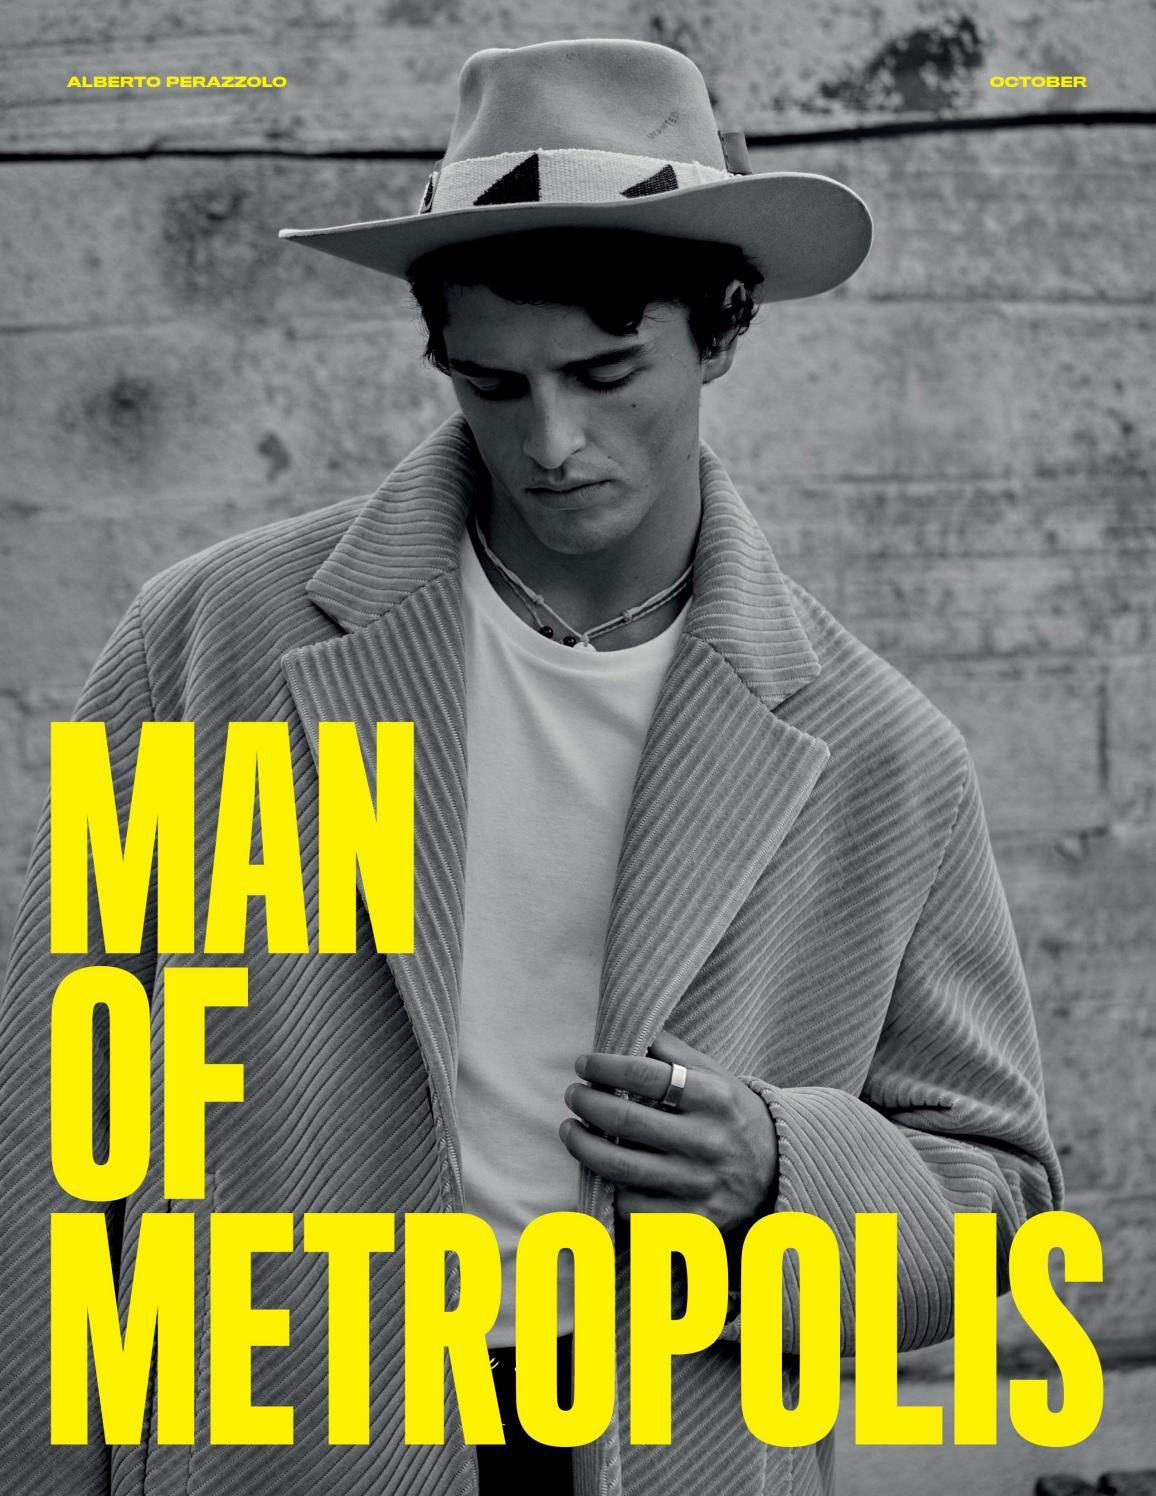 Man of Metropolis, October 2021